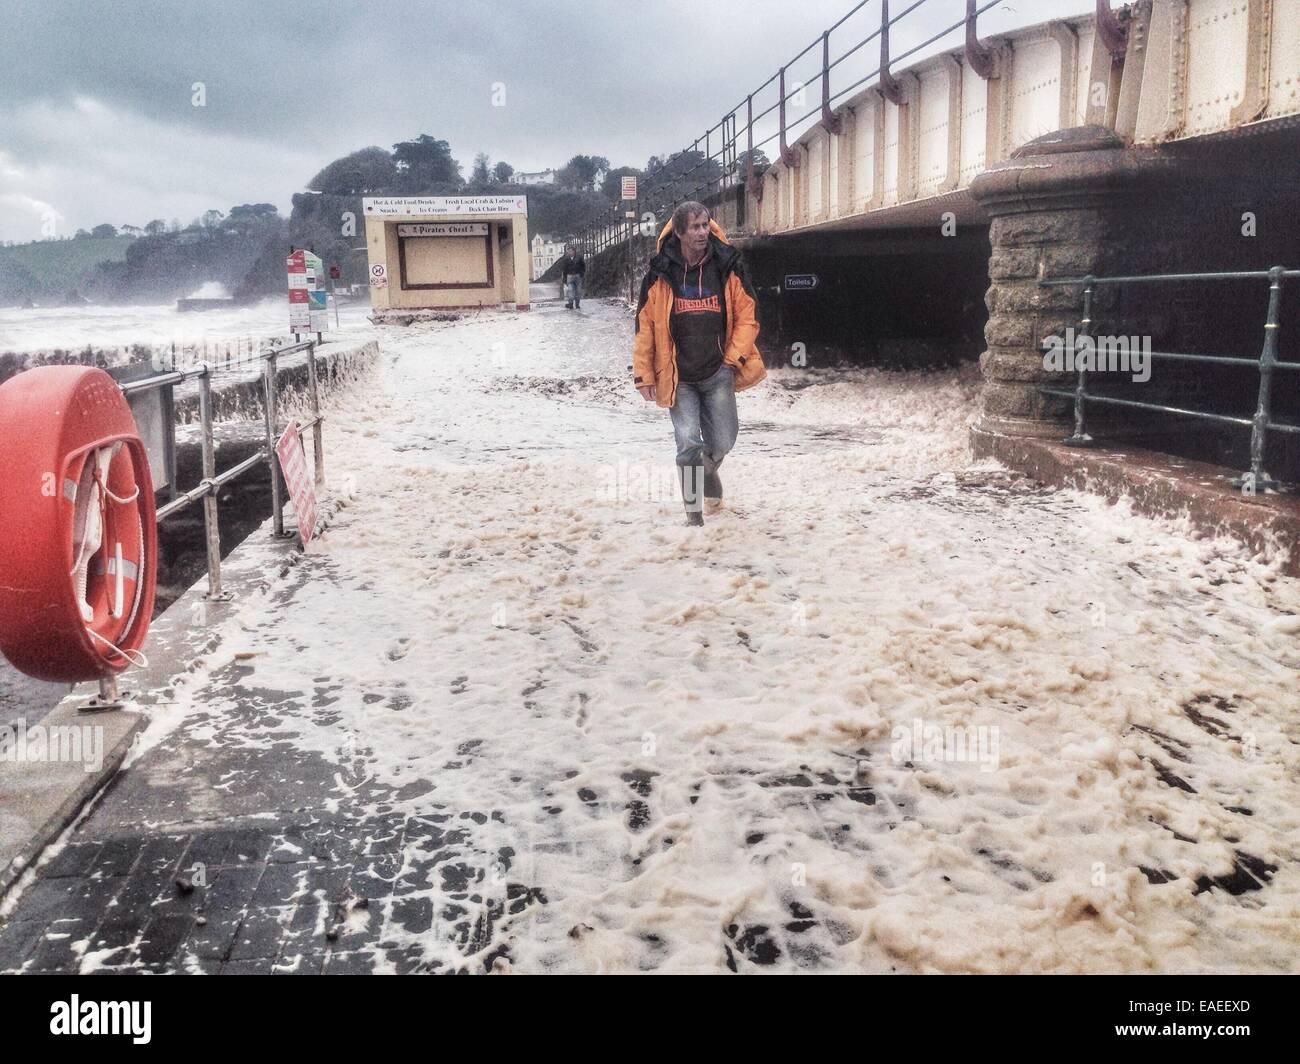 Dawlish Devon Uk 13 November 2014 Uk Wetter Sturm Und Wind